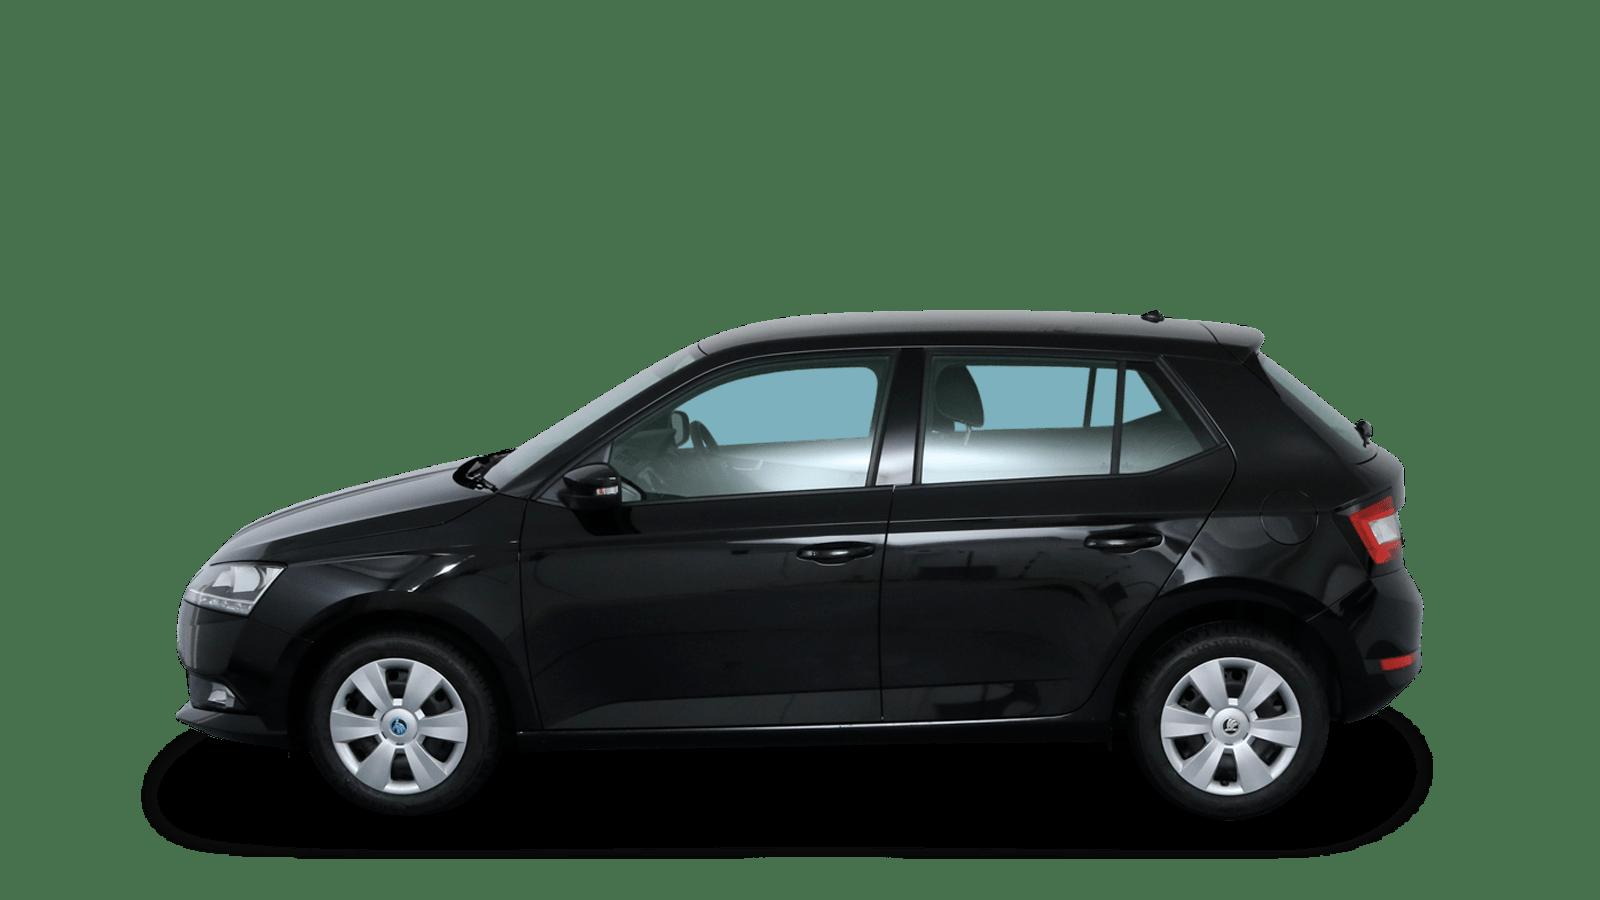 ŠKODA Fabia Black back - Clyde car subscription